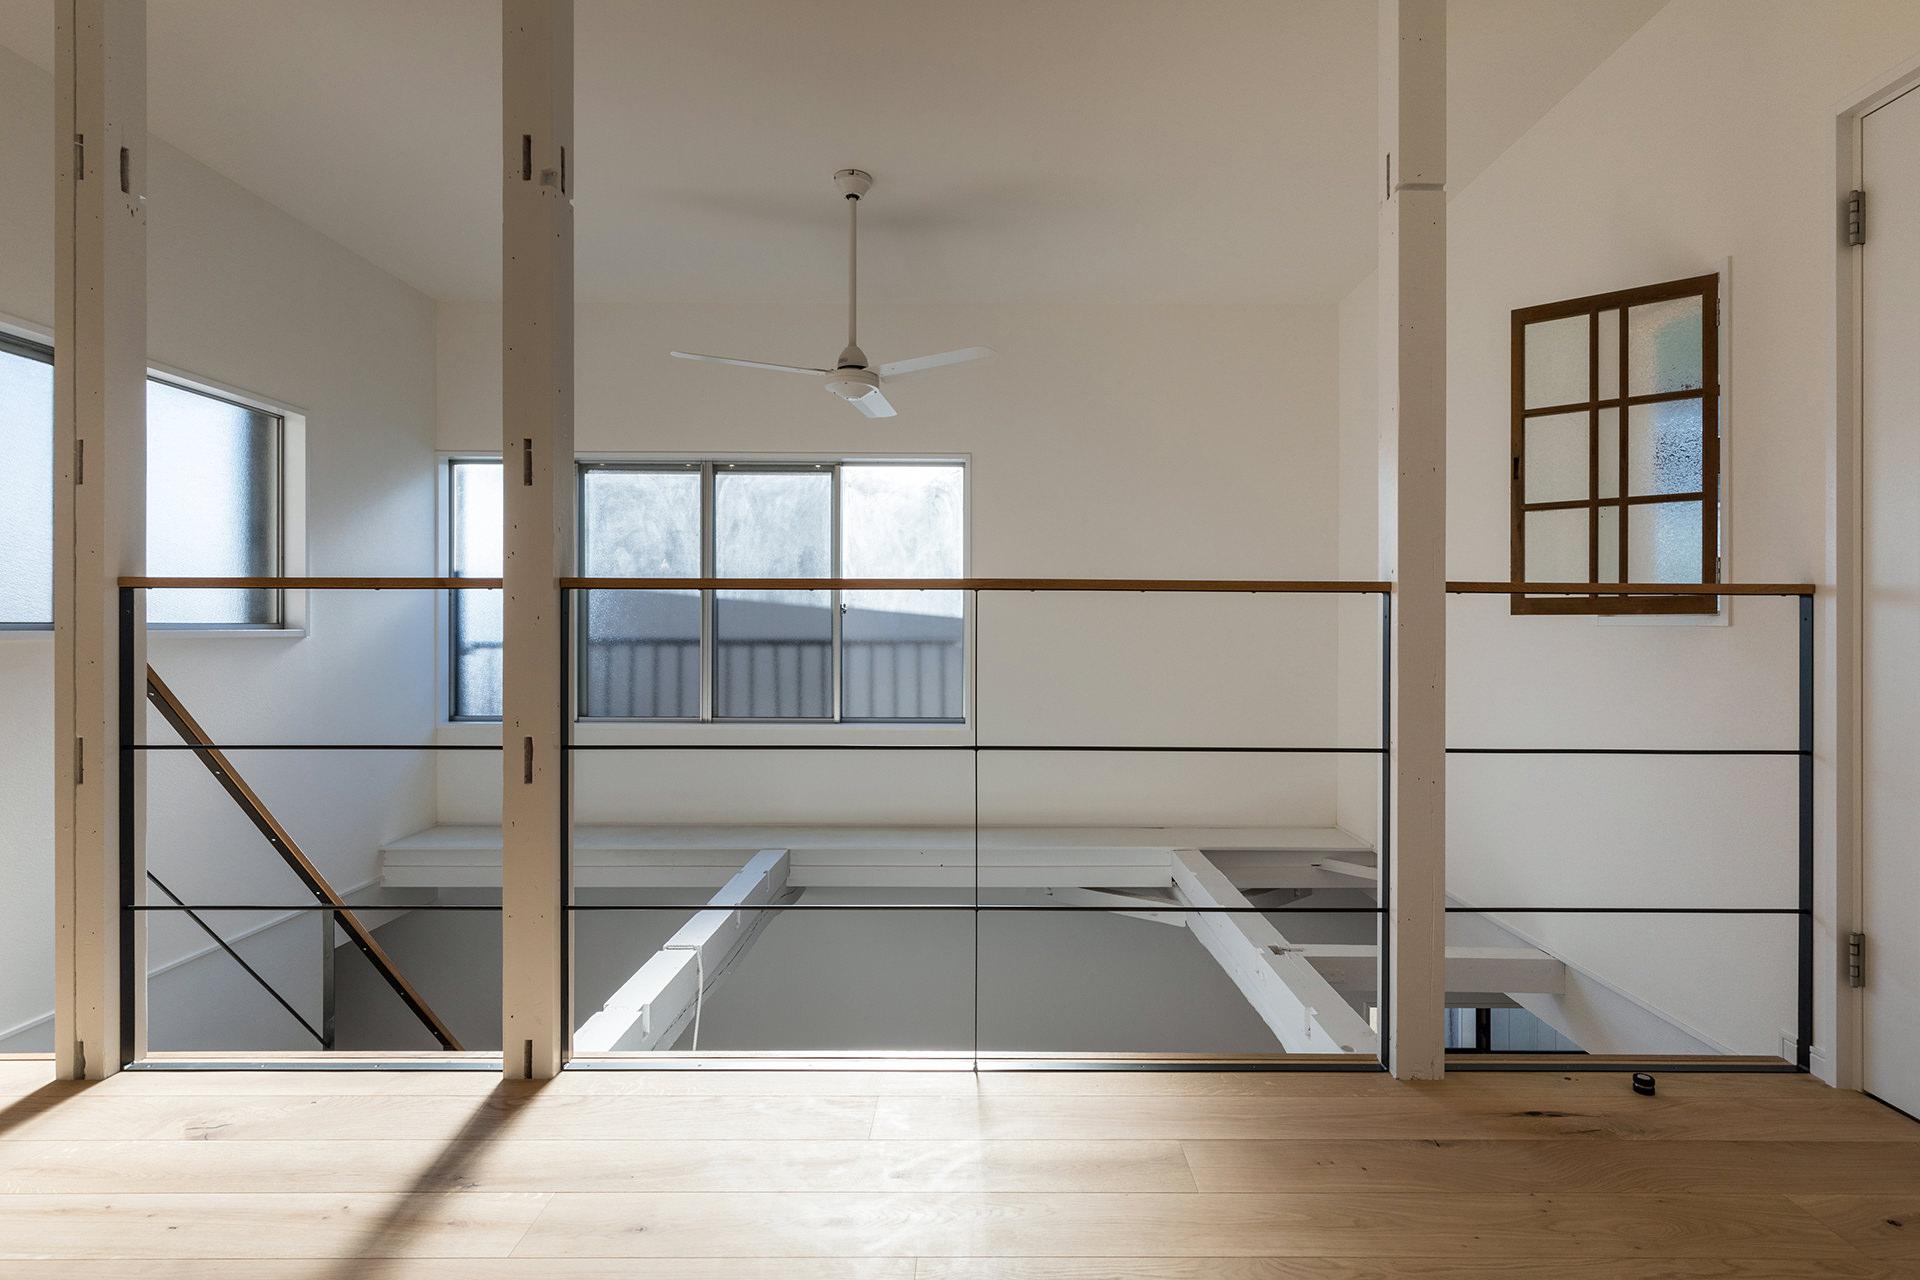 stri-ep house* 由比ヶ浜 イメージ10 撮影:東涌宏和